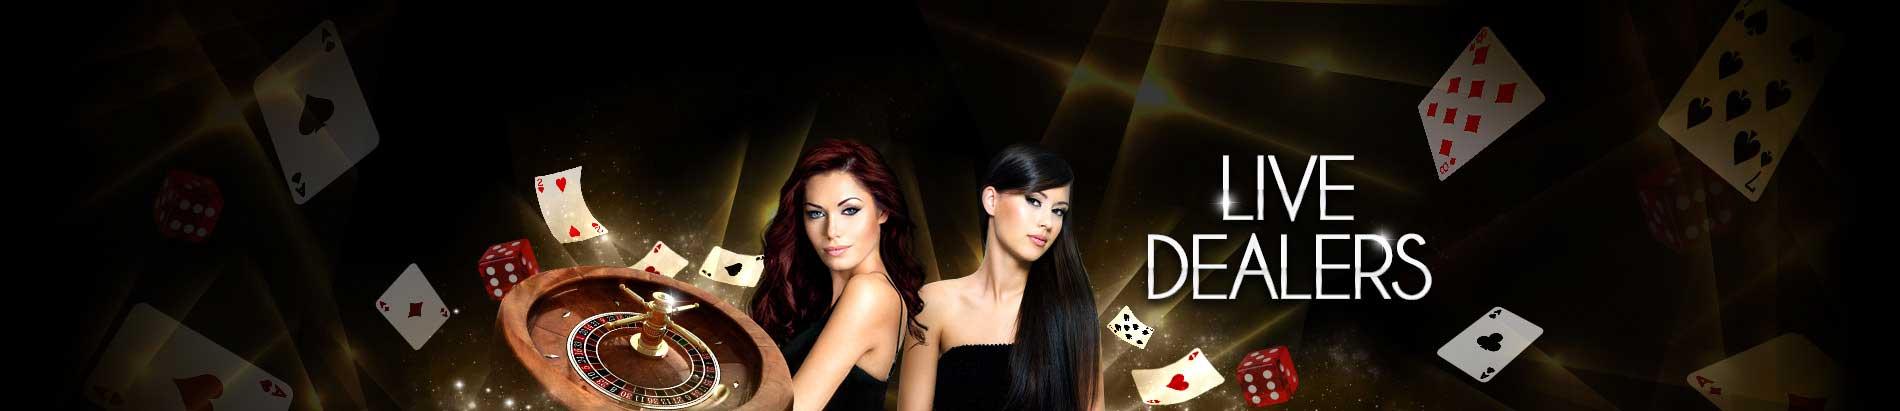 NetBet live dealers casino